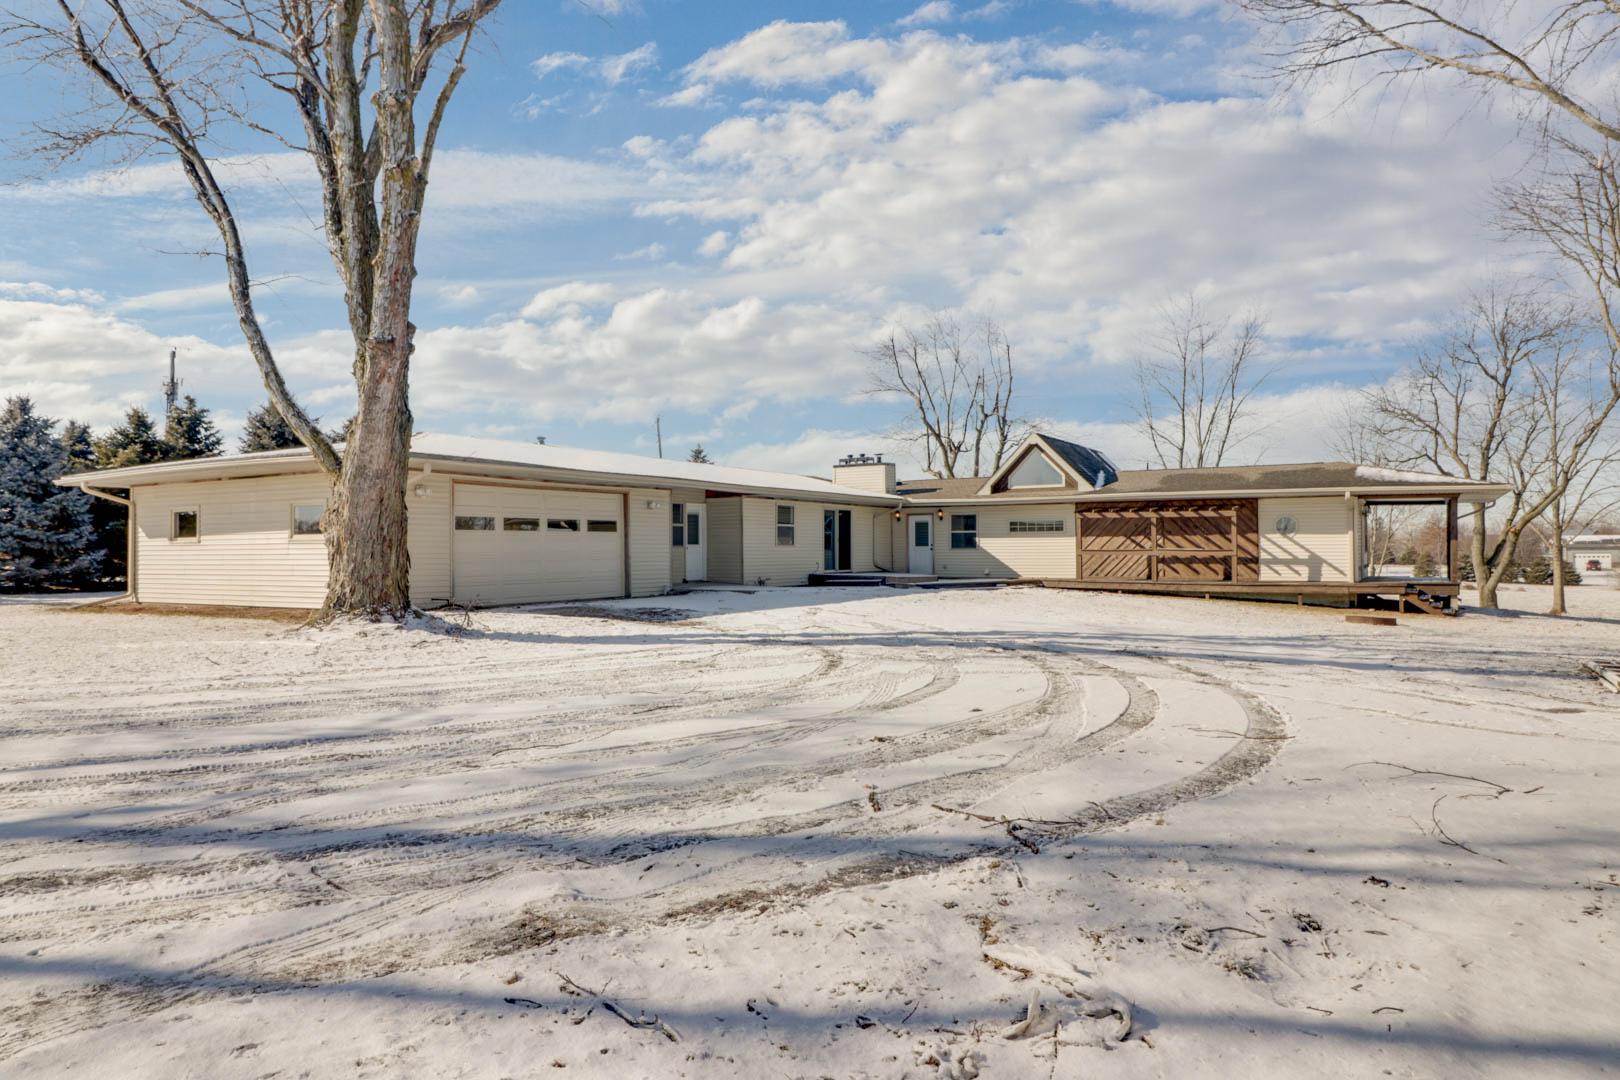 9688 Old Peoria Road Bloomington, IL 61705